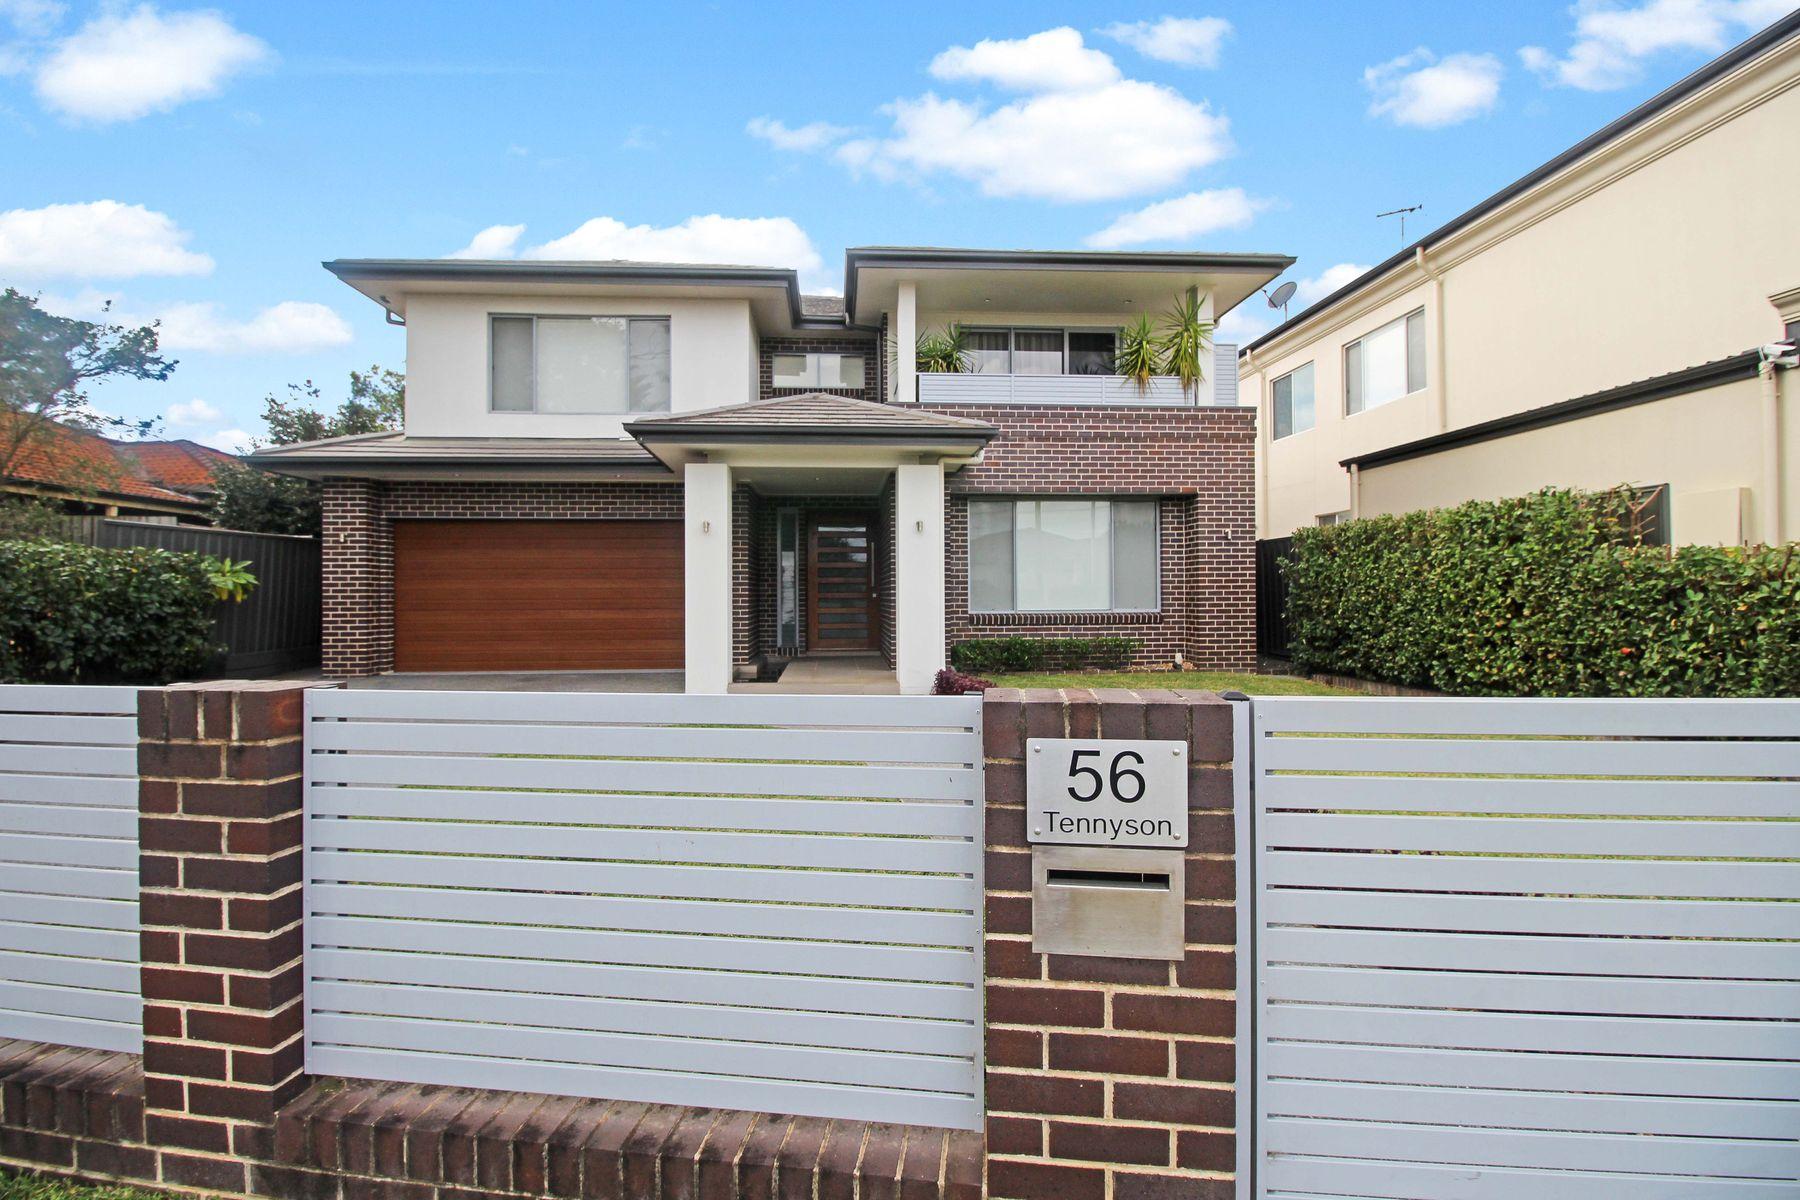 56 Tennyson Road, Gladesville, NSW 2111